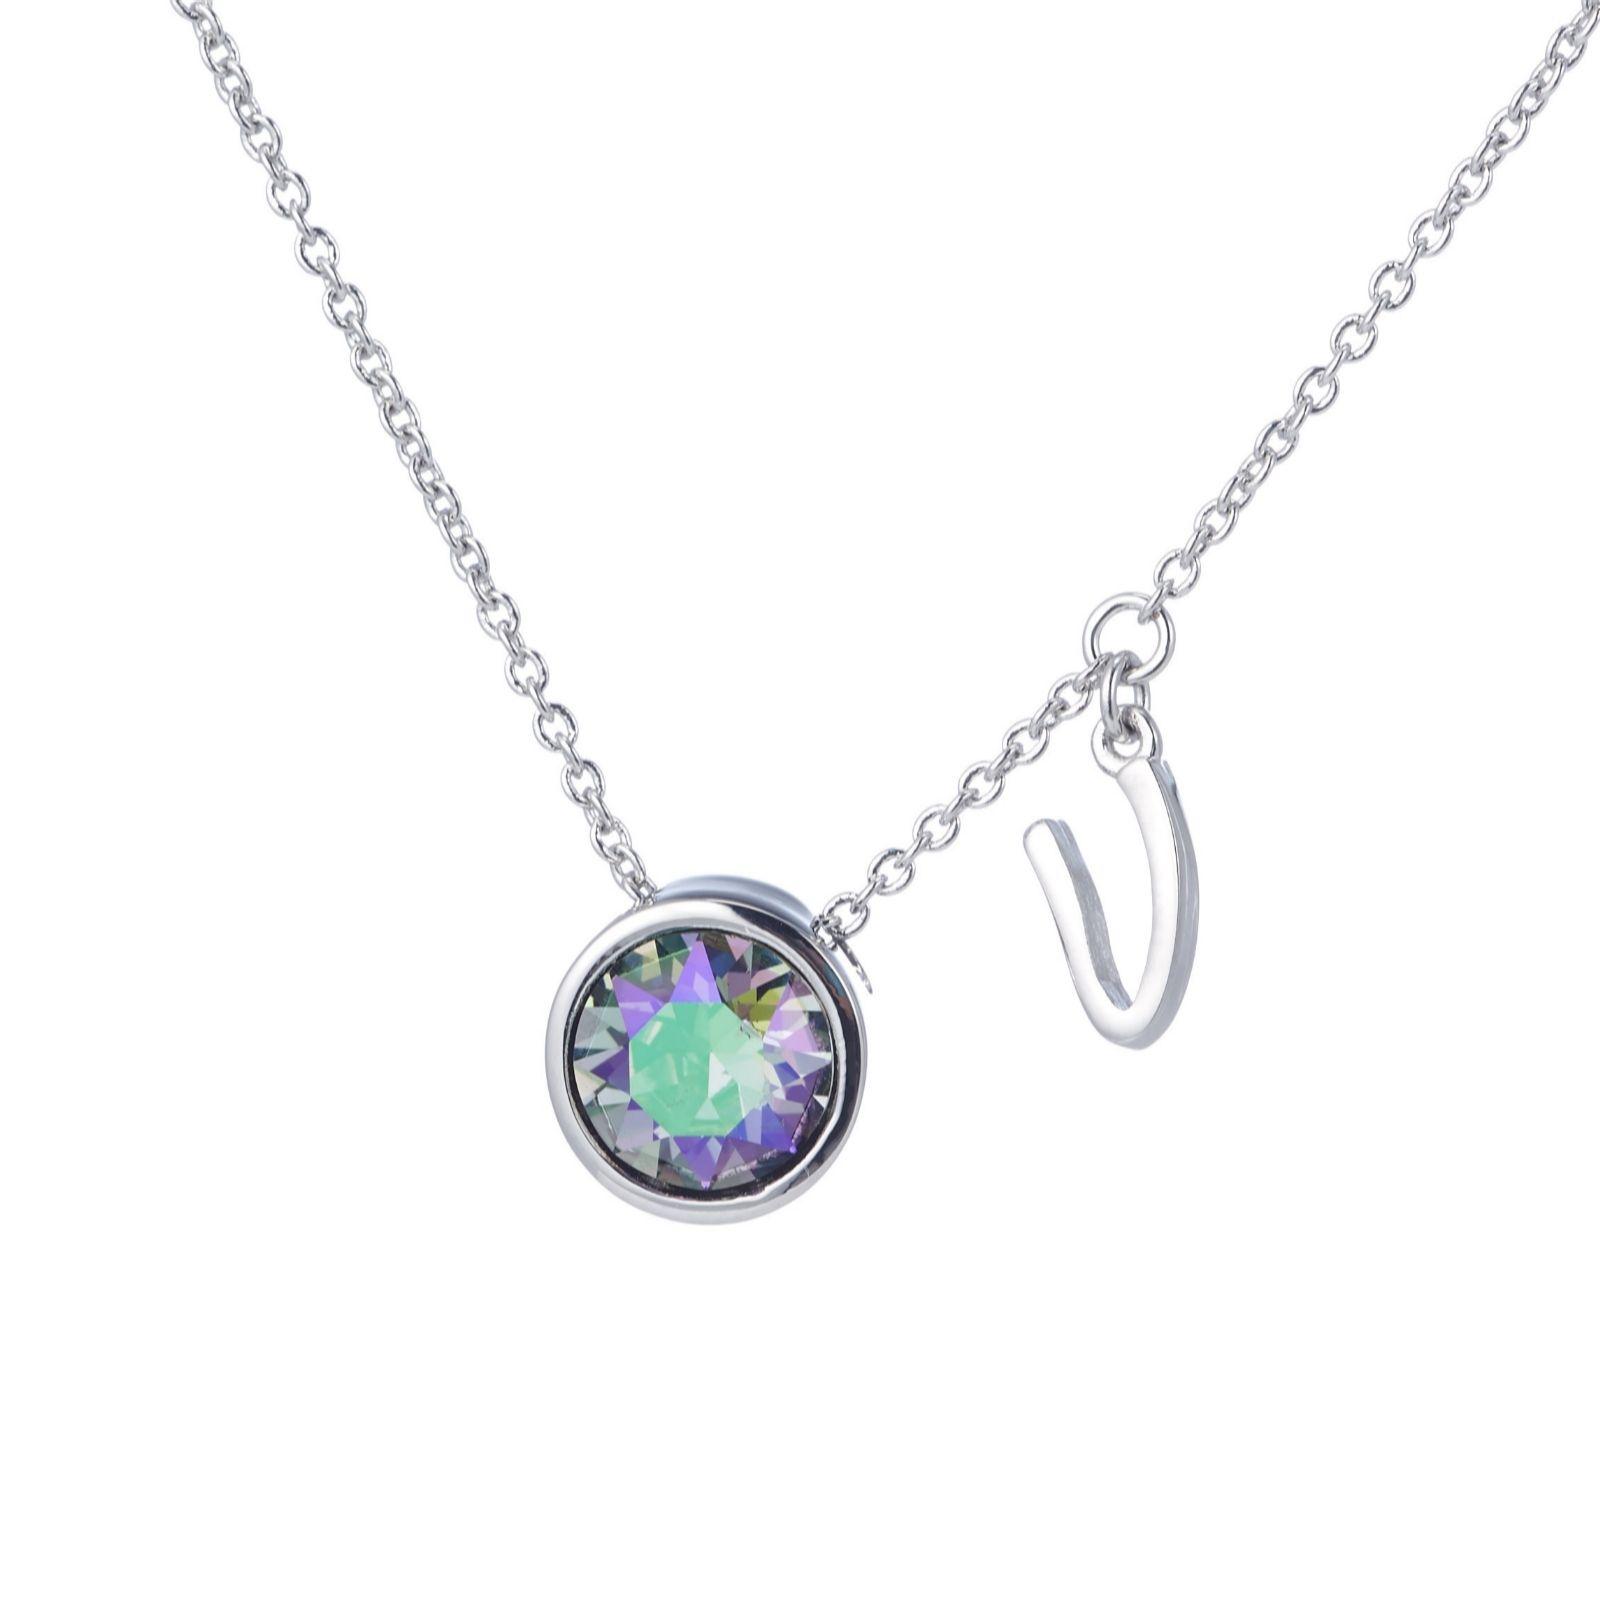 82b3642fe10ecc Outlet Aurora Swarovski Crystal Initial Charm 52cm Necklace - Page 1 - QVC  UK